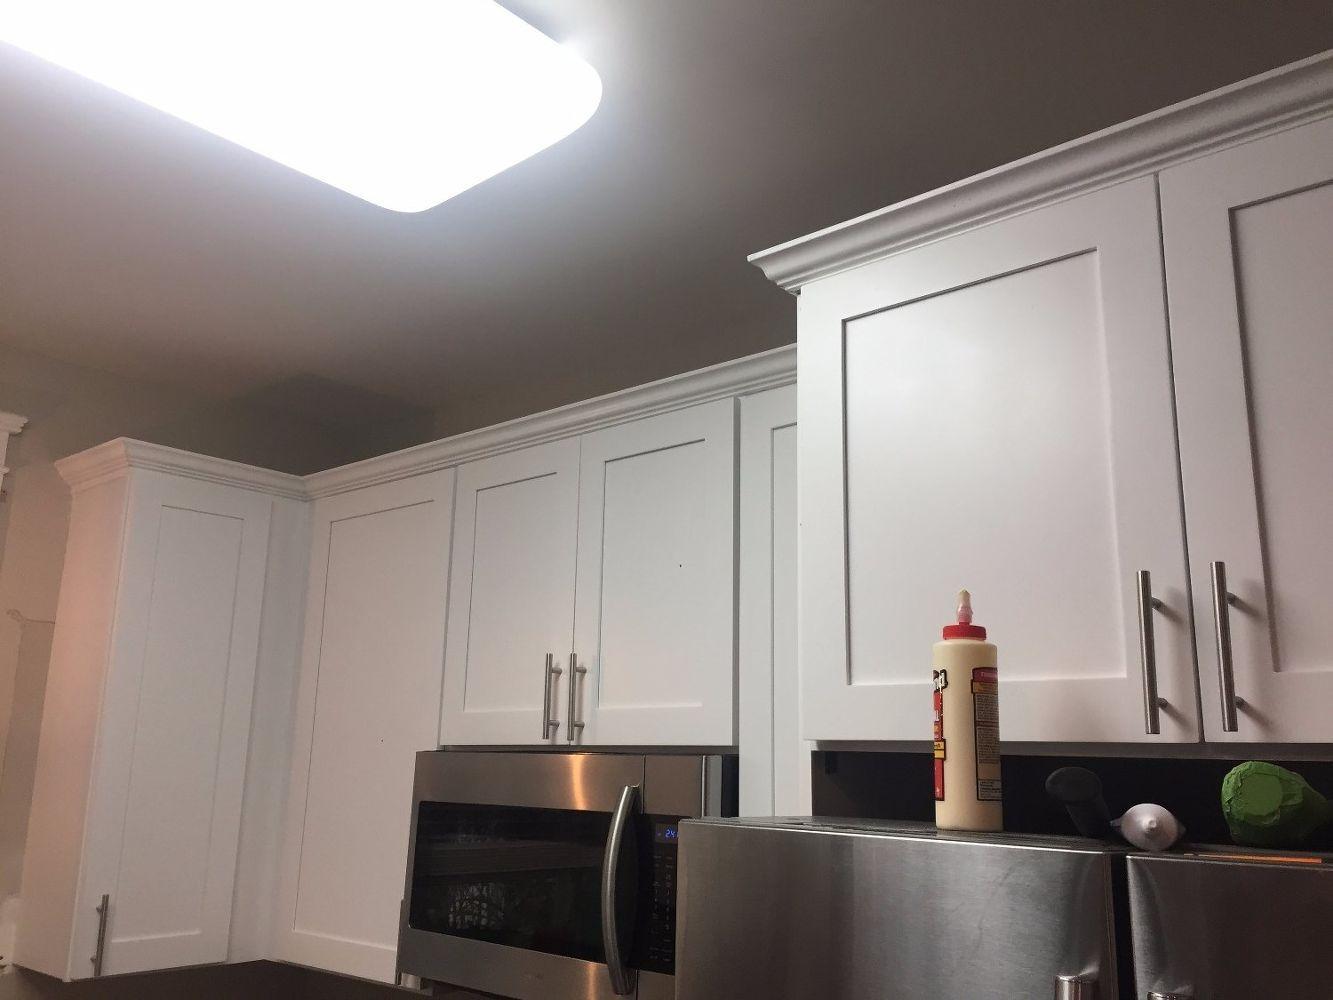 Kitchen Cabinet Crown Molding Make Them Fancy In 2020 Kitchen Cabinet Crown Molding Kitchen Cabinets Refacing Kitchen Cabinets